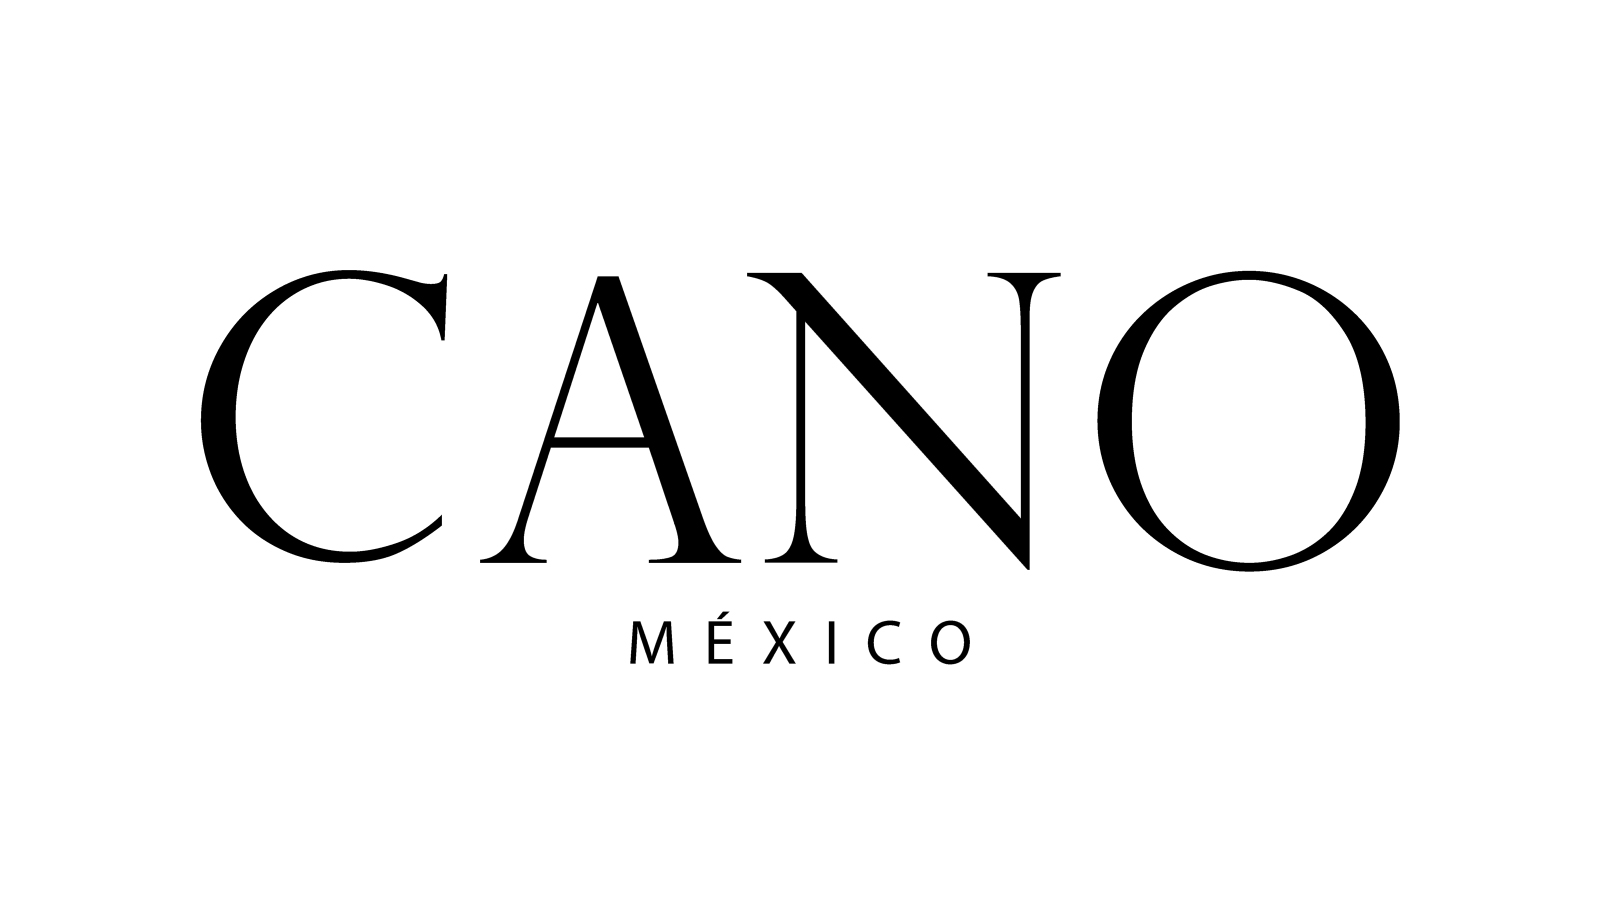 The Cano Shoe